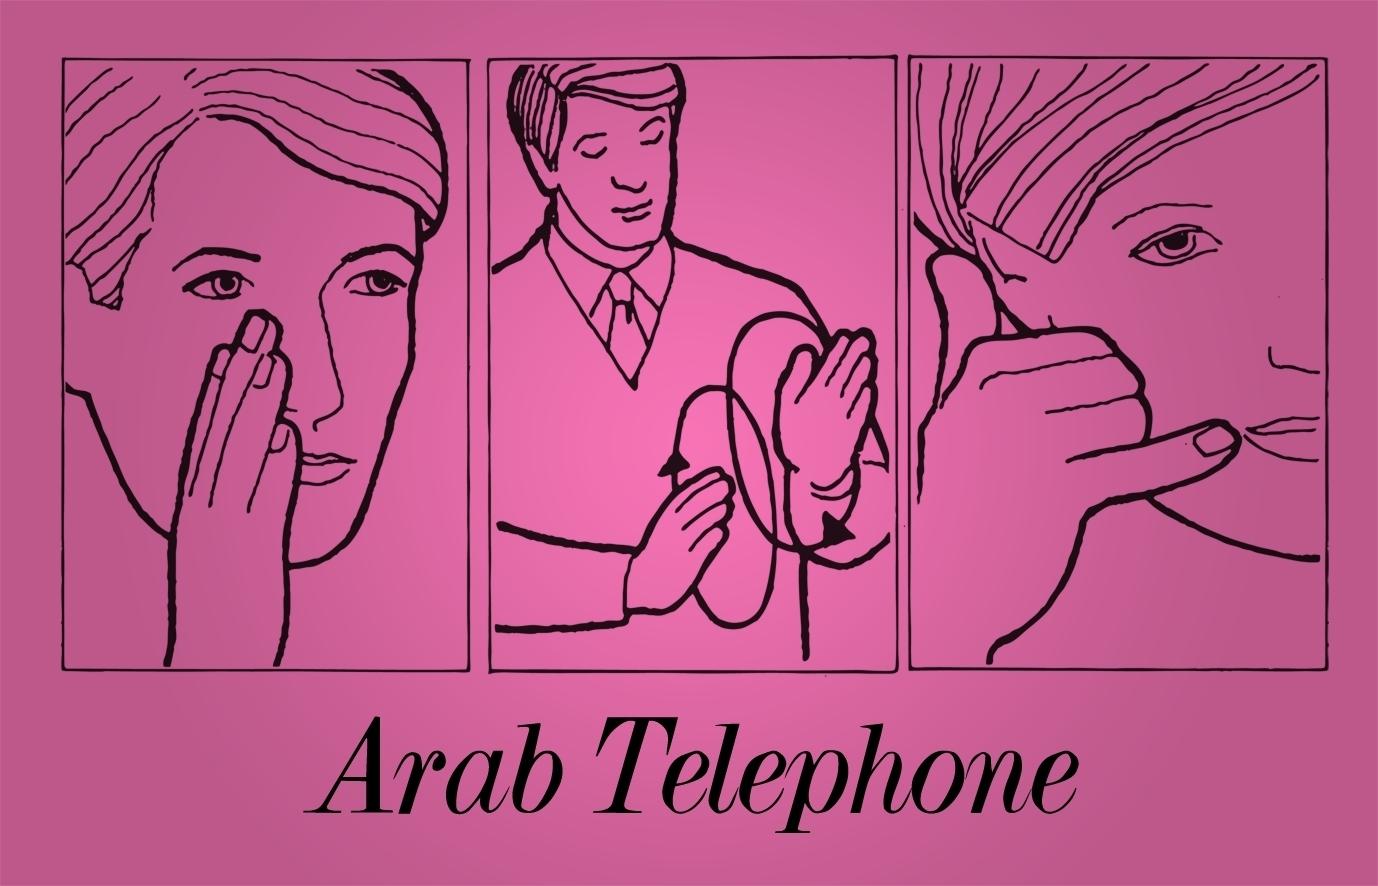 Arab Telephone image